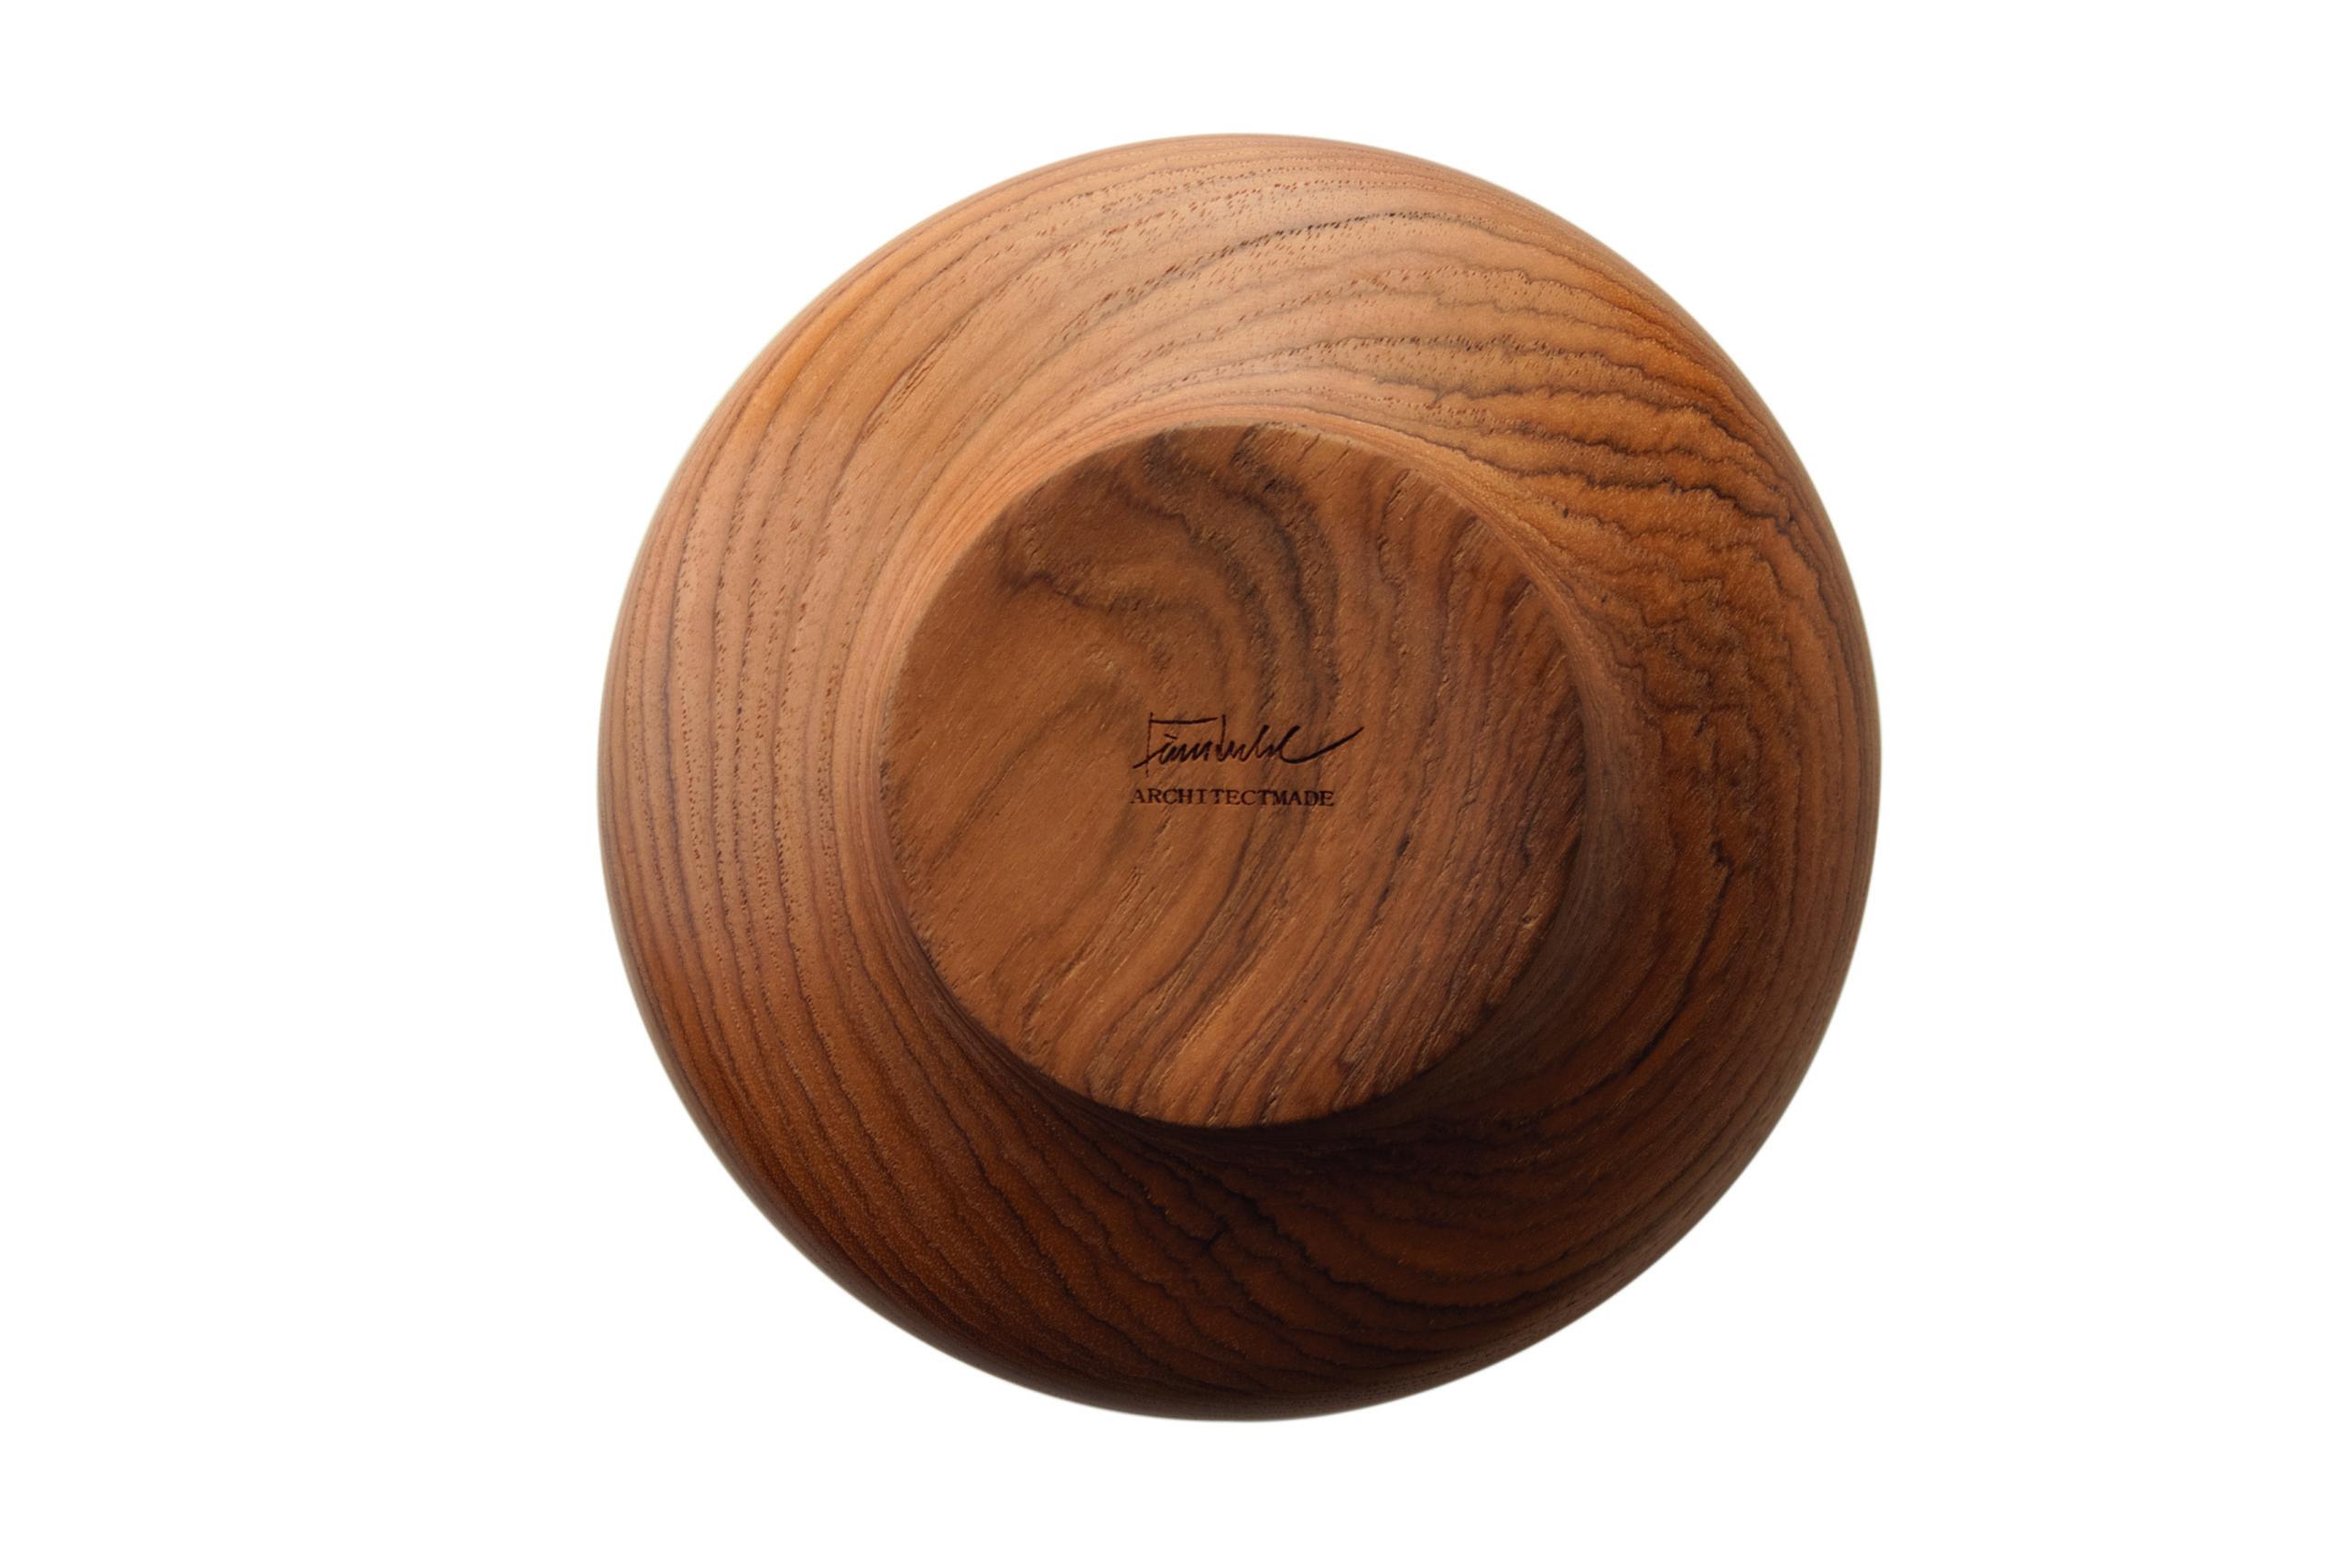 Architectmade-FJ-Bowl-15-Teak-Finn-Juhl-2